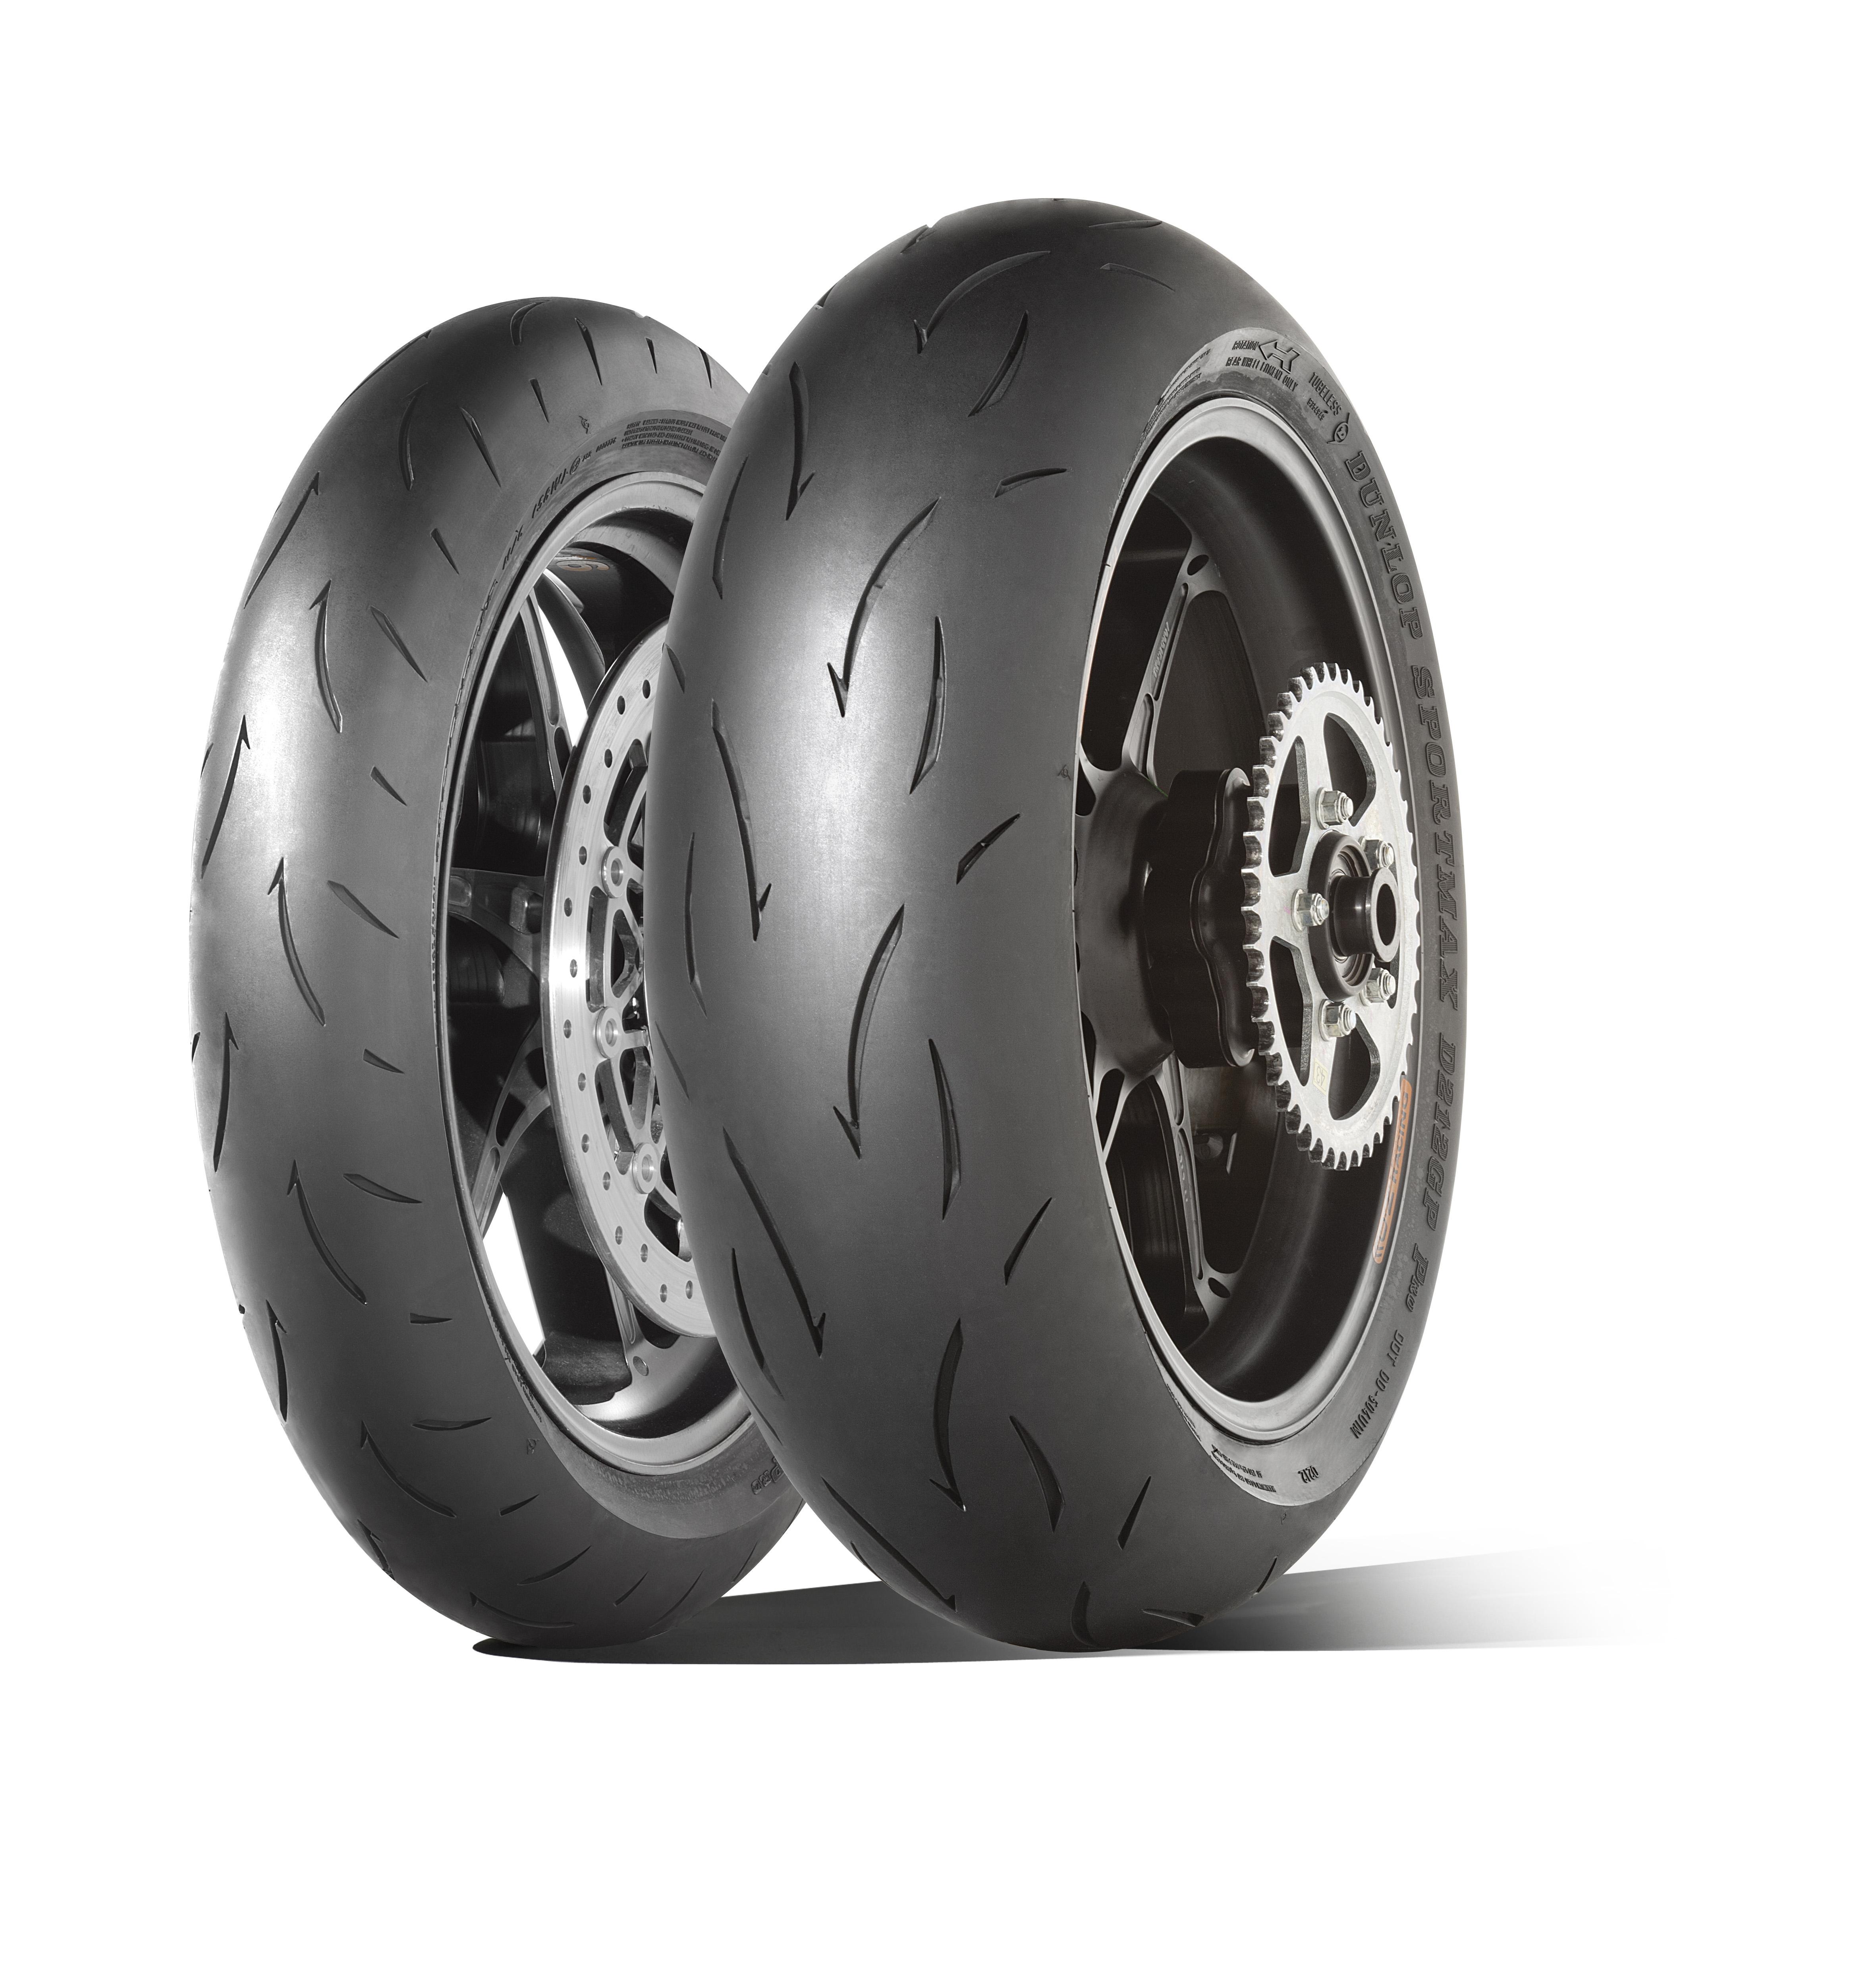 мотошины Dunlop Sportmax D212 GP Pro MS4 190/55 R17 75W